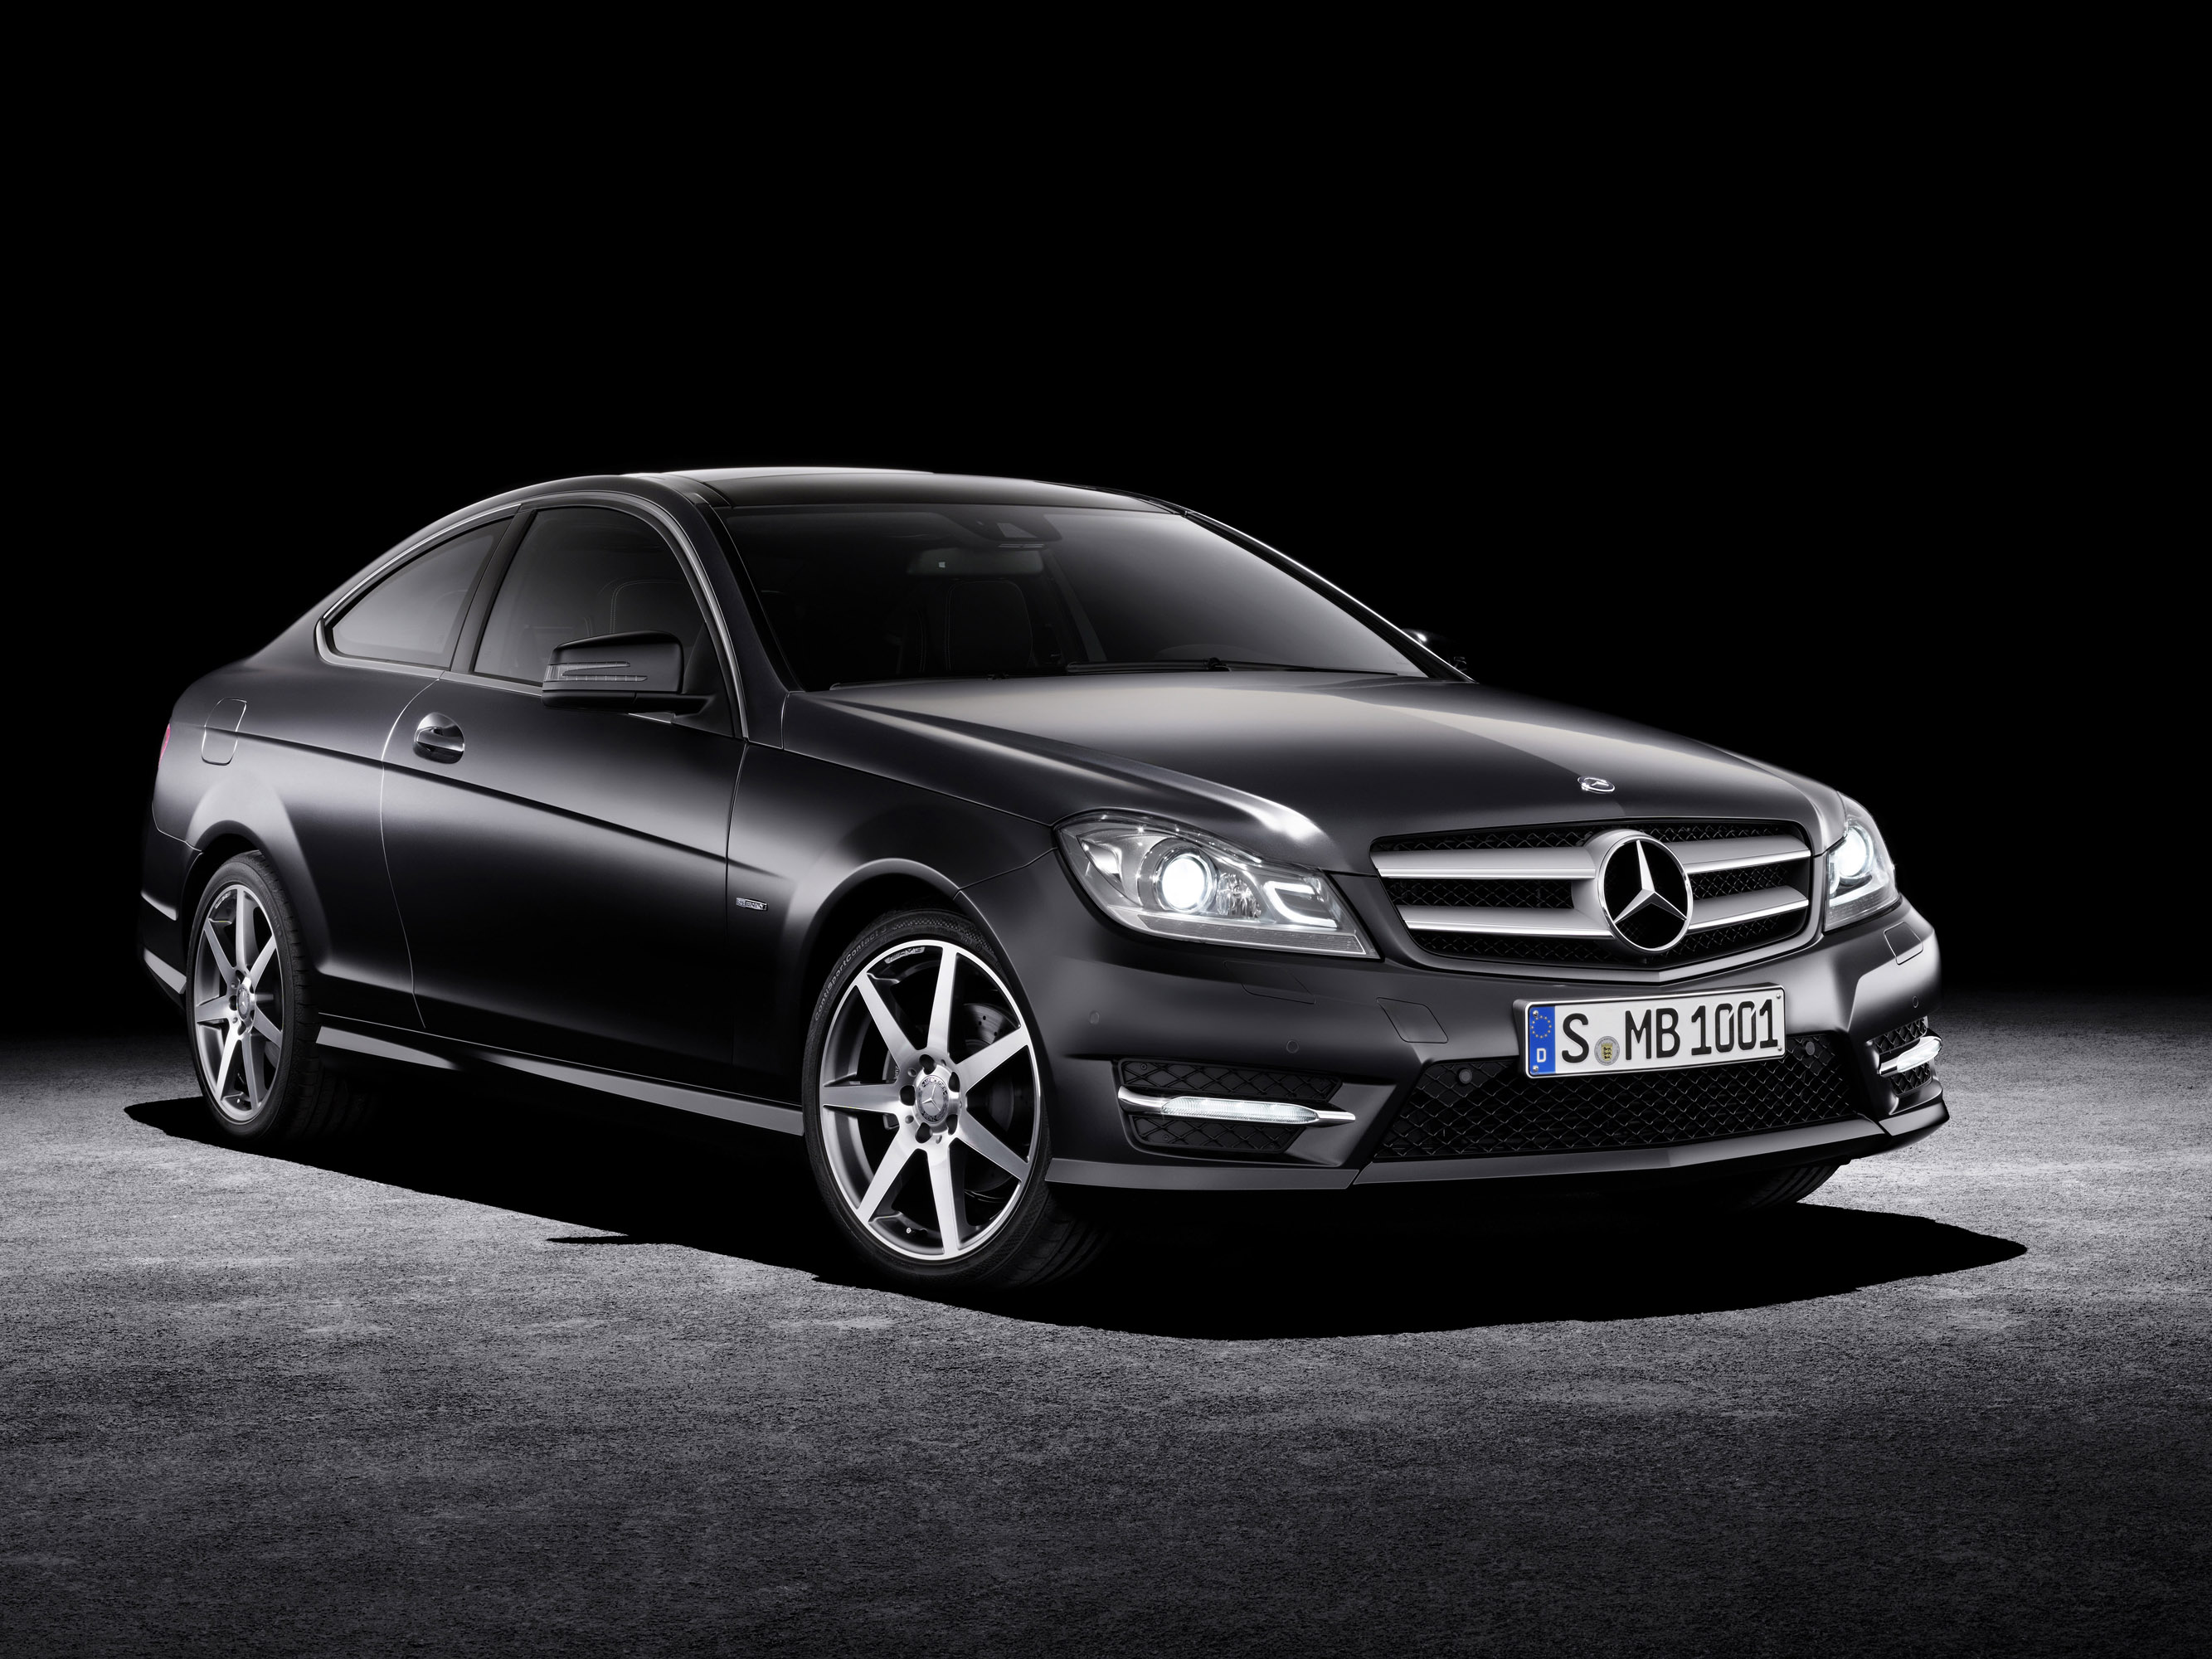 Mercedes-Benz C-Class Coupe photo #1